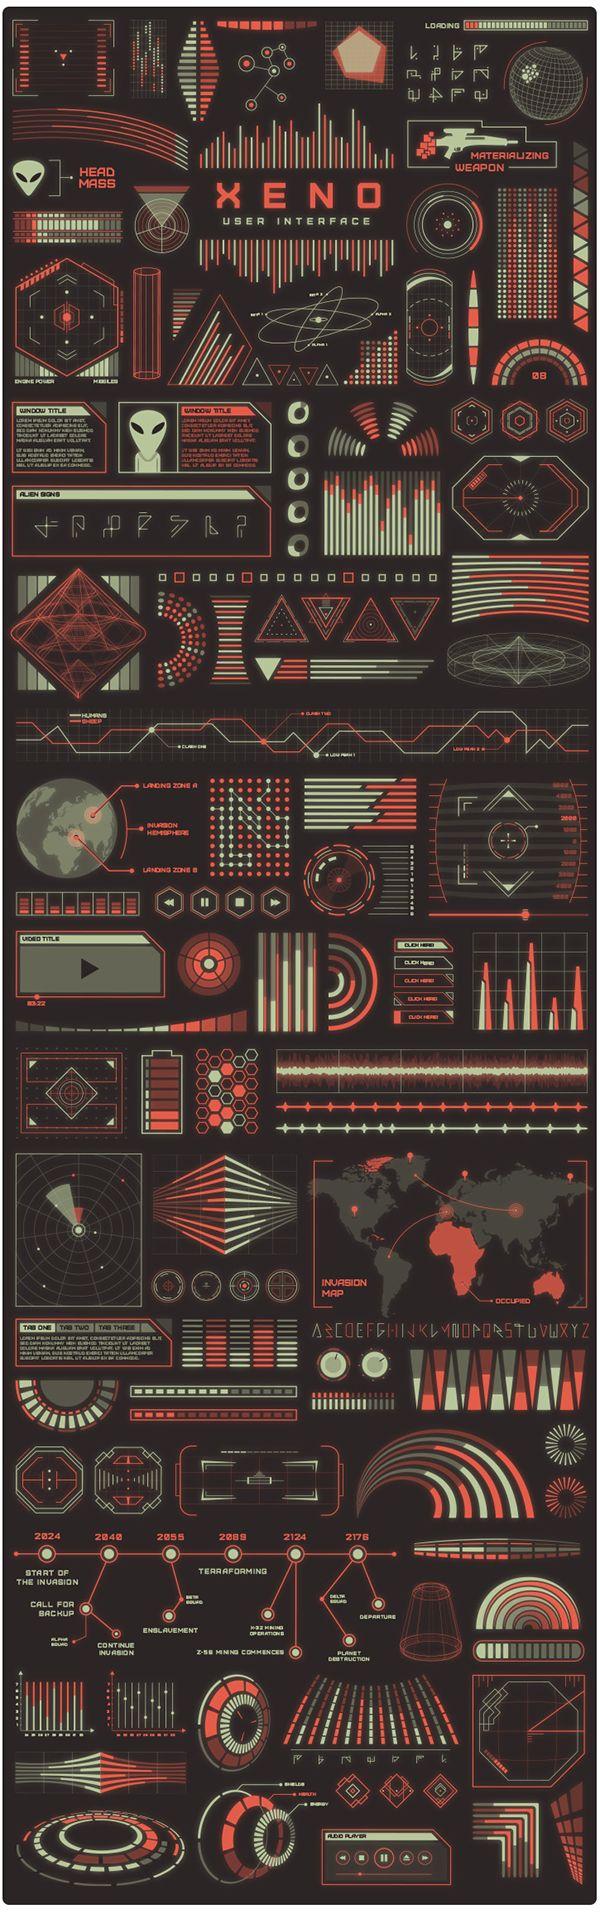 Xeno UI Kit by Mehmet Reha Tugcu